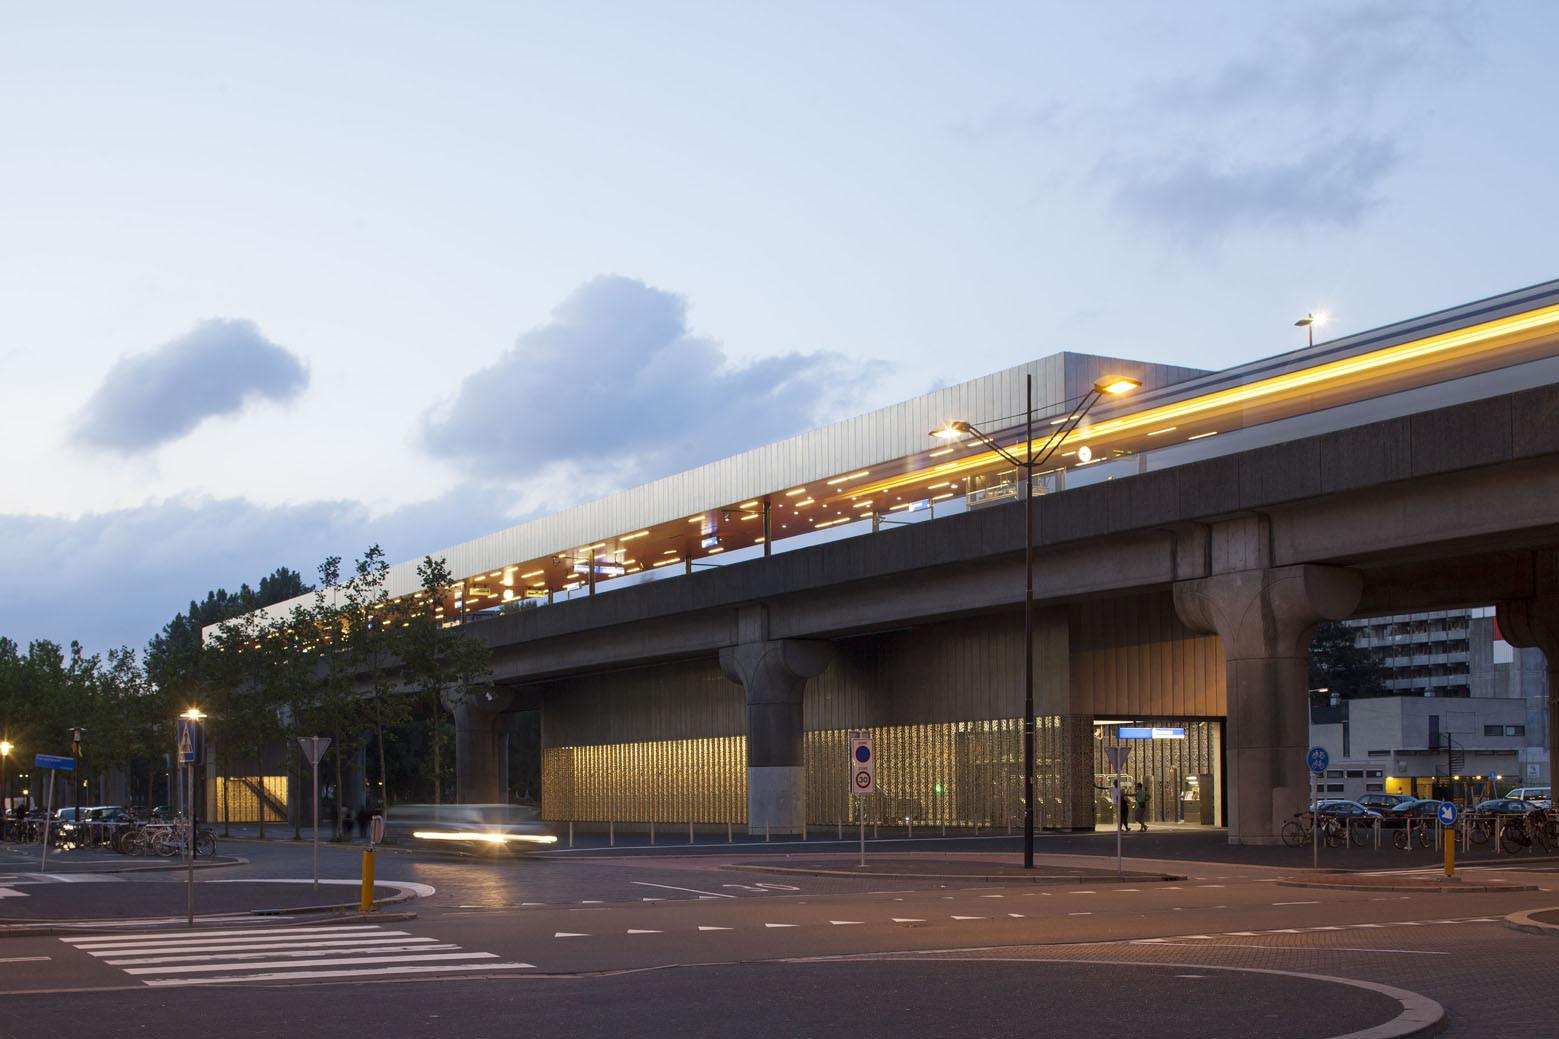 Amsterdam Metro Station / Maccreanor Lavington Architects, Courtesy of Maccreanor Lavington